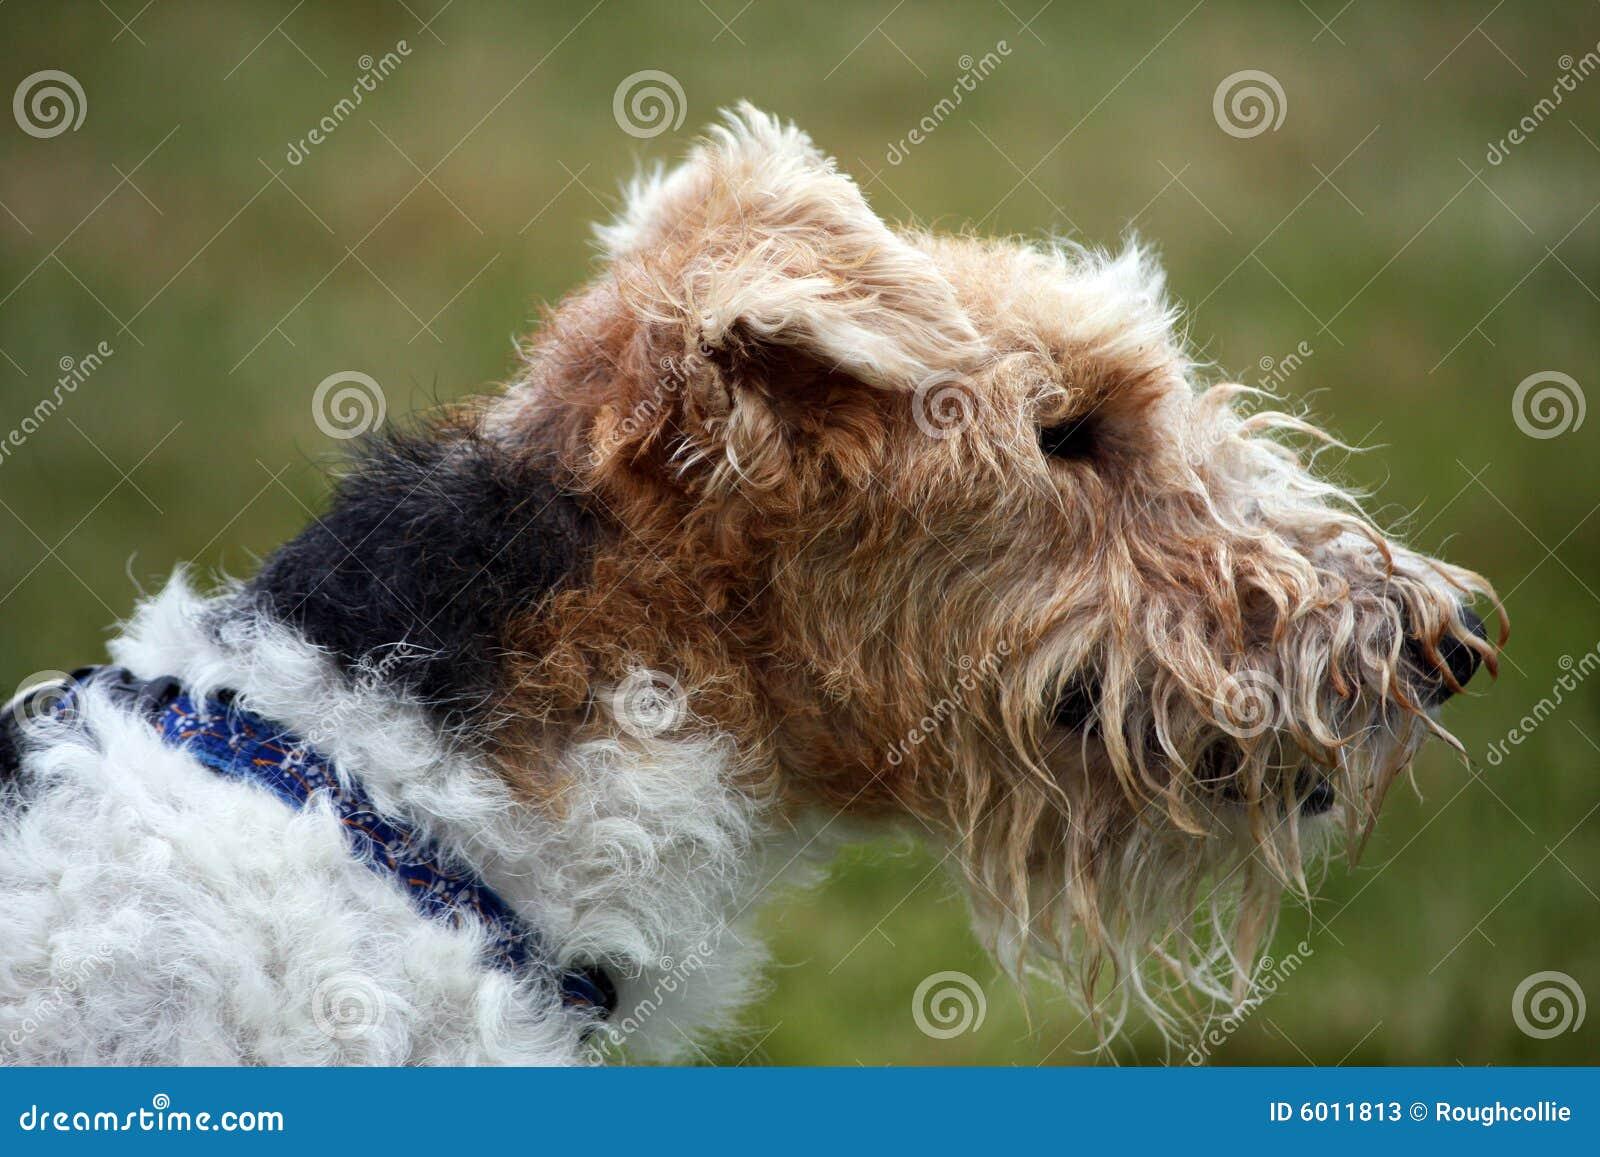 Terrier de Fox wire-haired